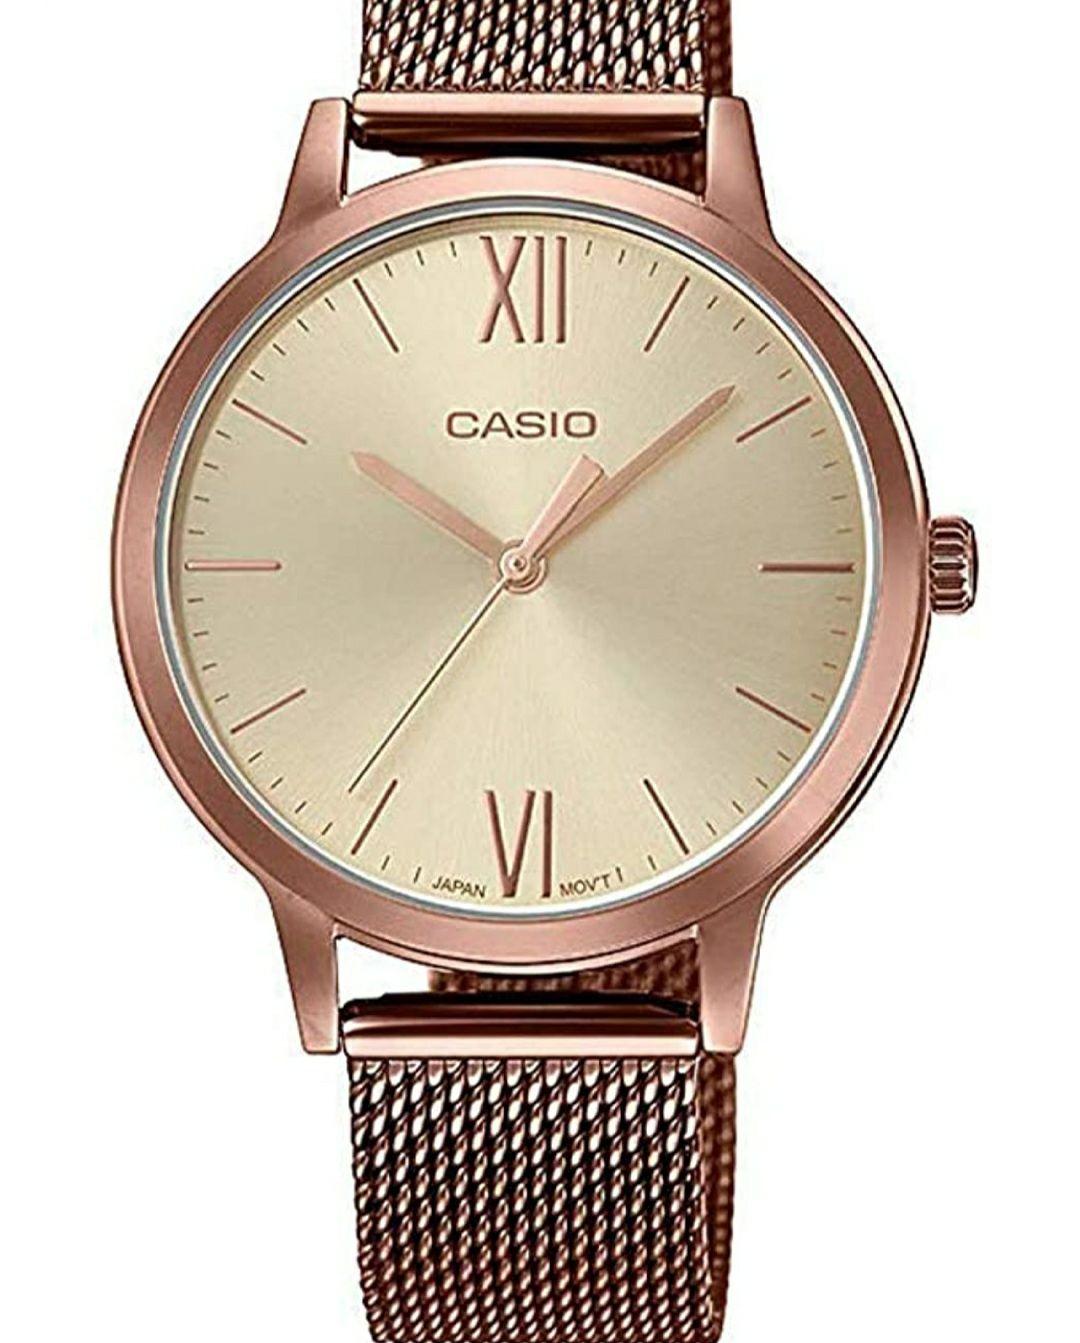 Reloj Casio mujer. Mínimo histórico!!!!